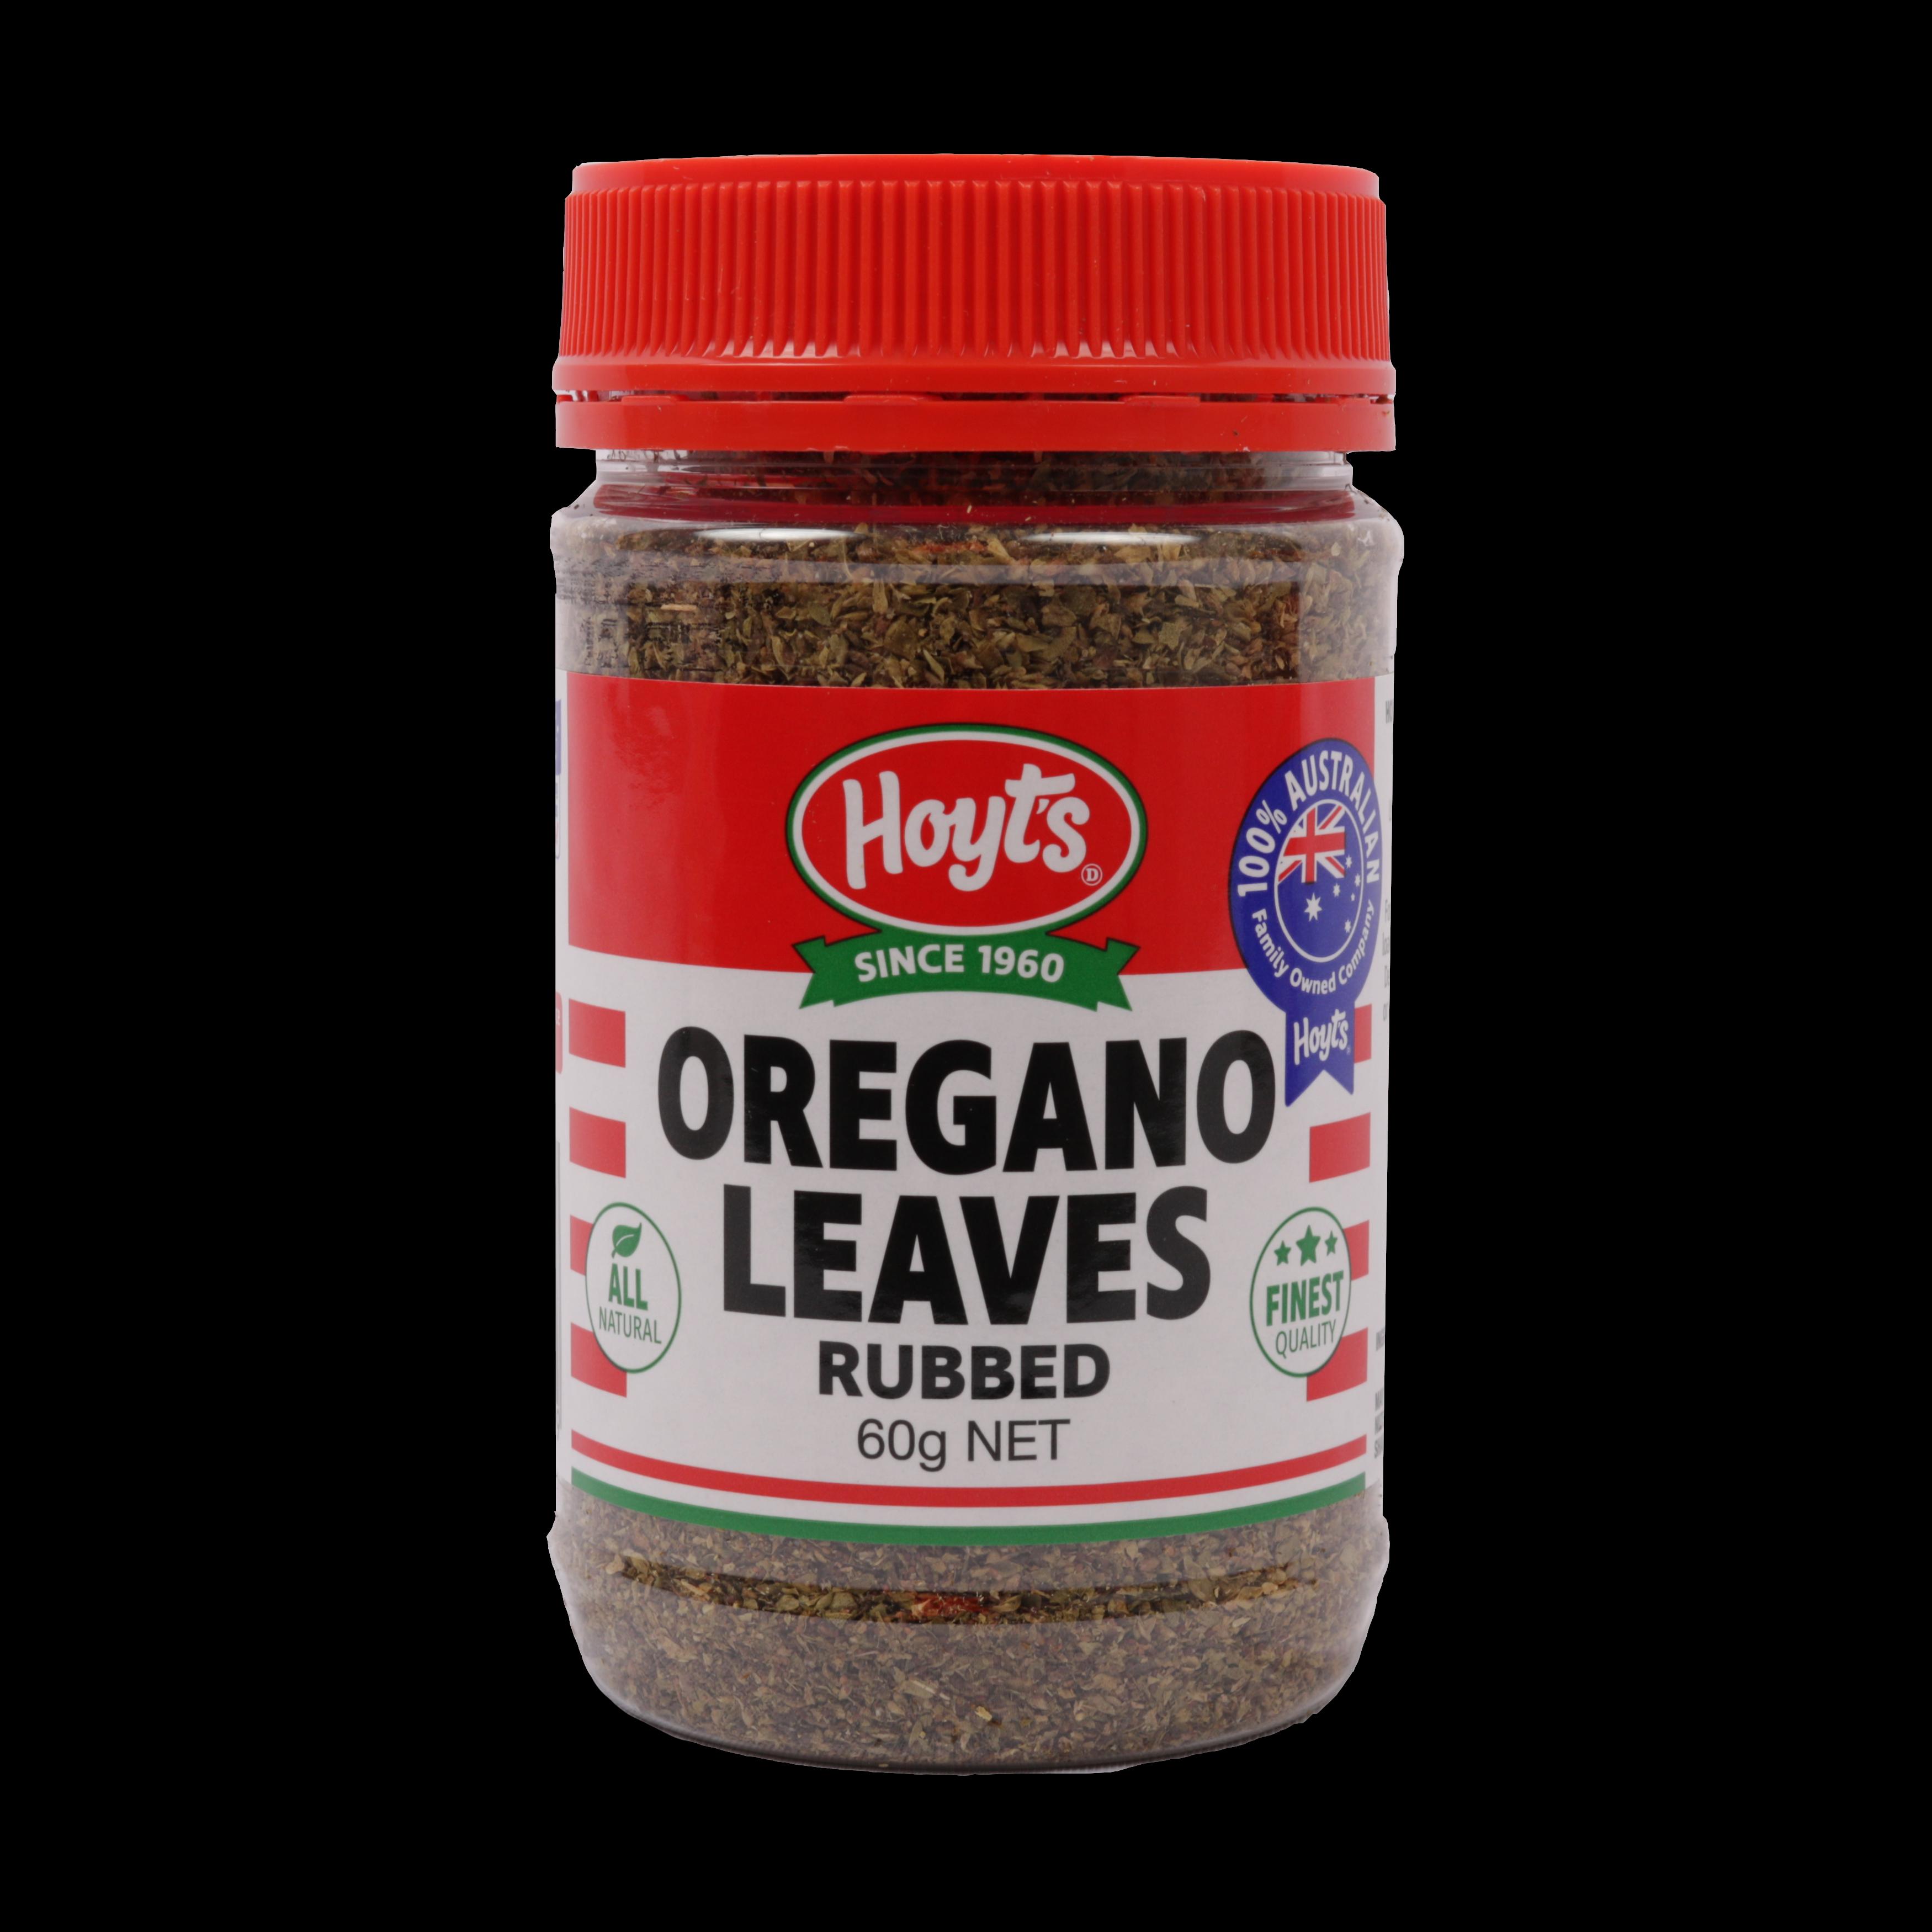 Hoyts Oregano Leaves 60g